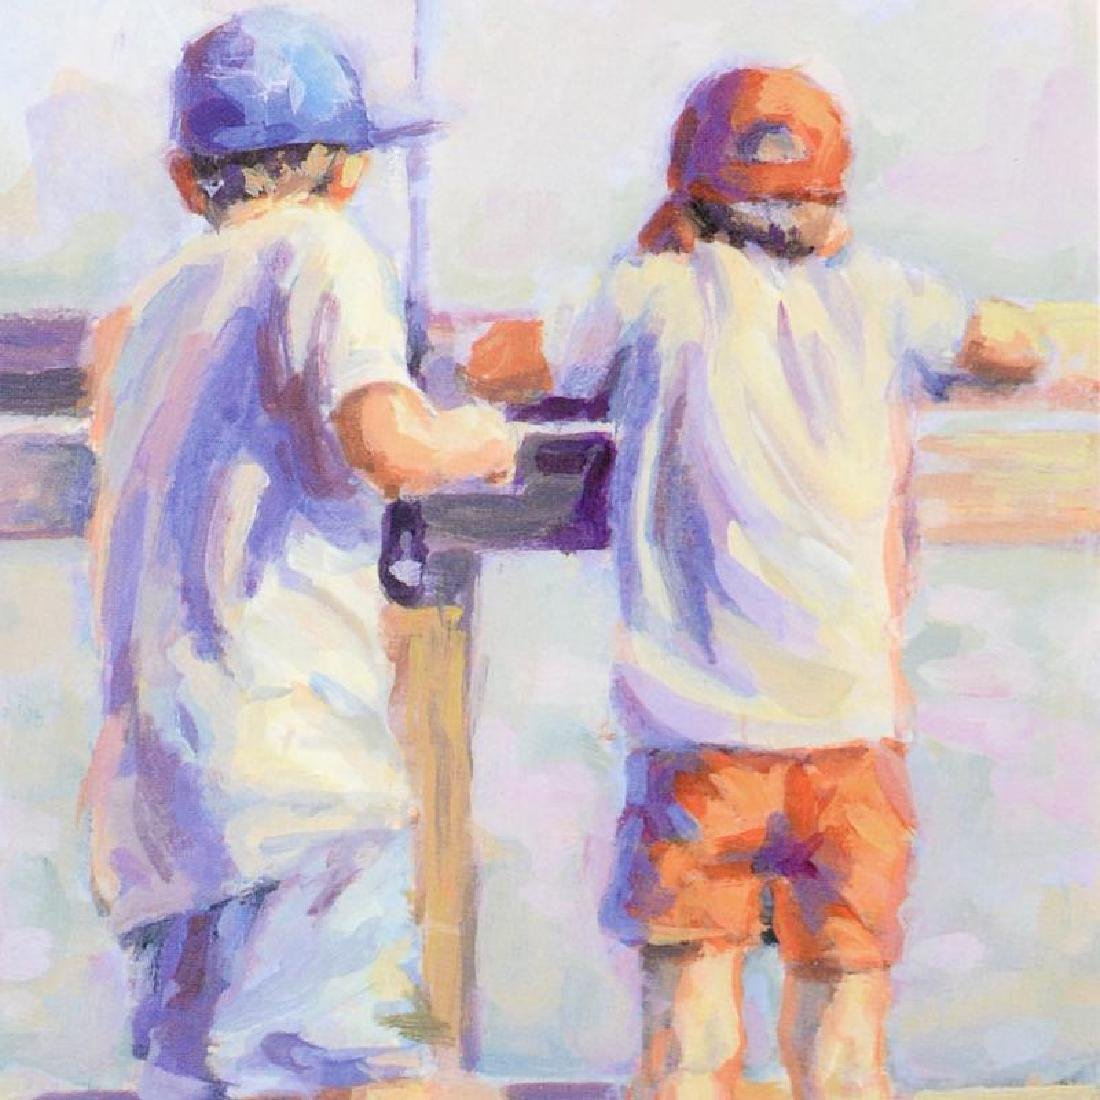 Little Fishermen by Raad, Lucelle - 2